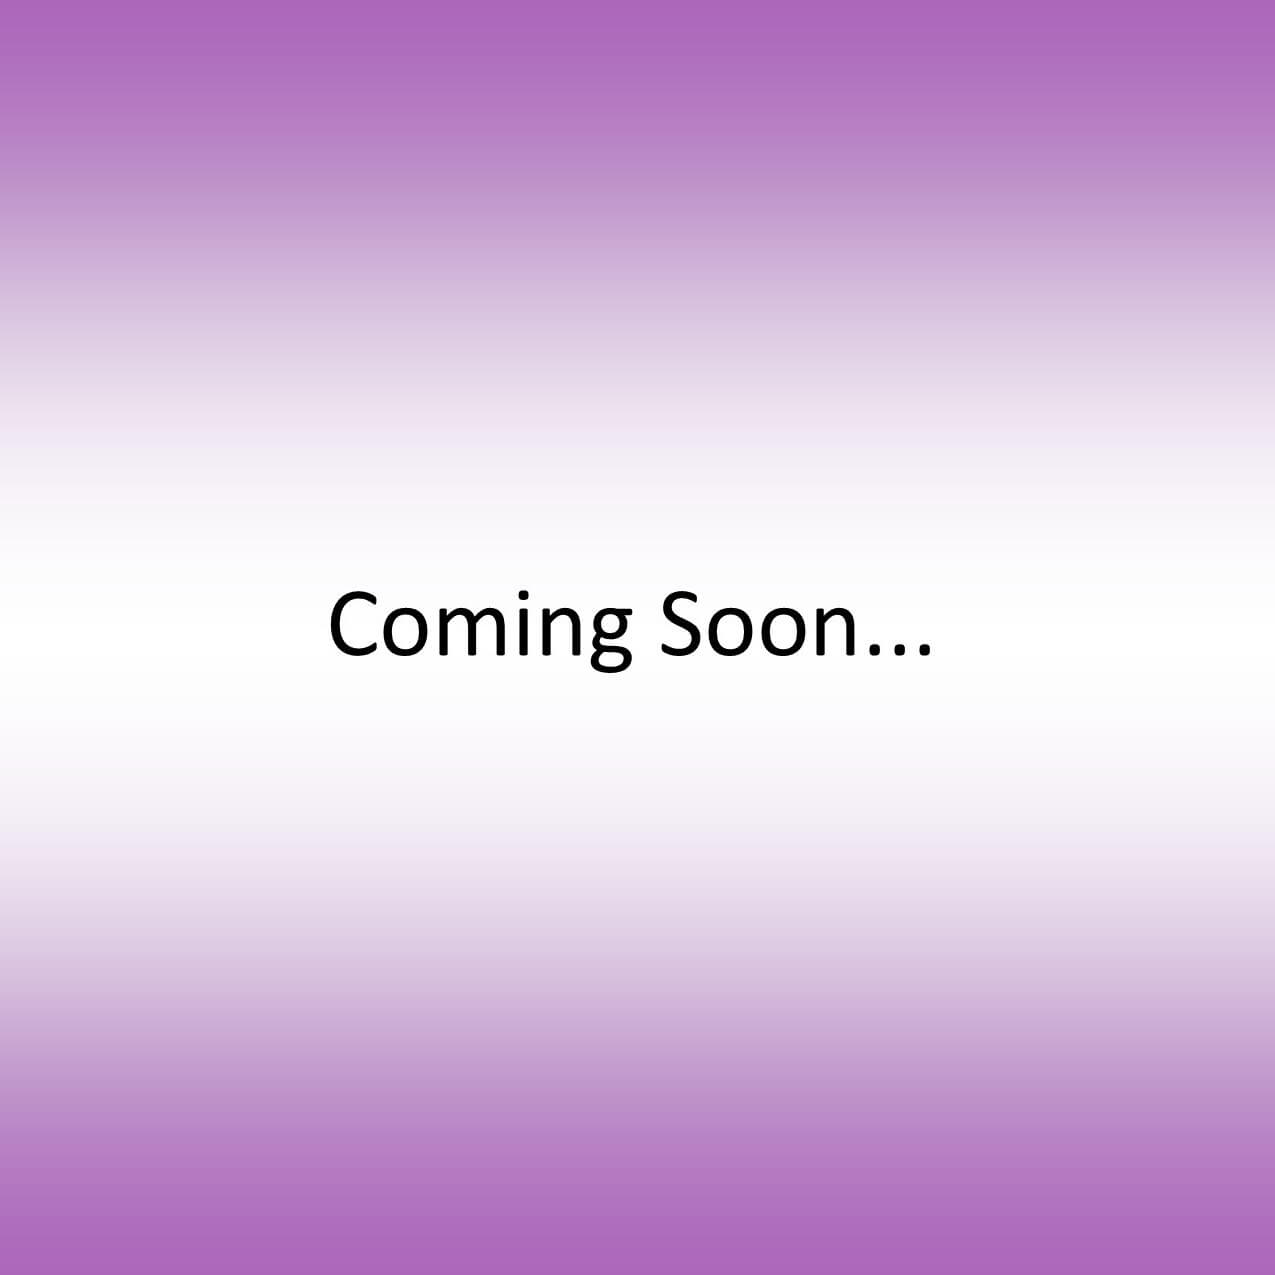 Coming Soon Purple square